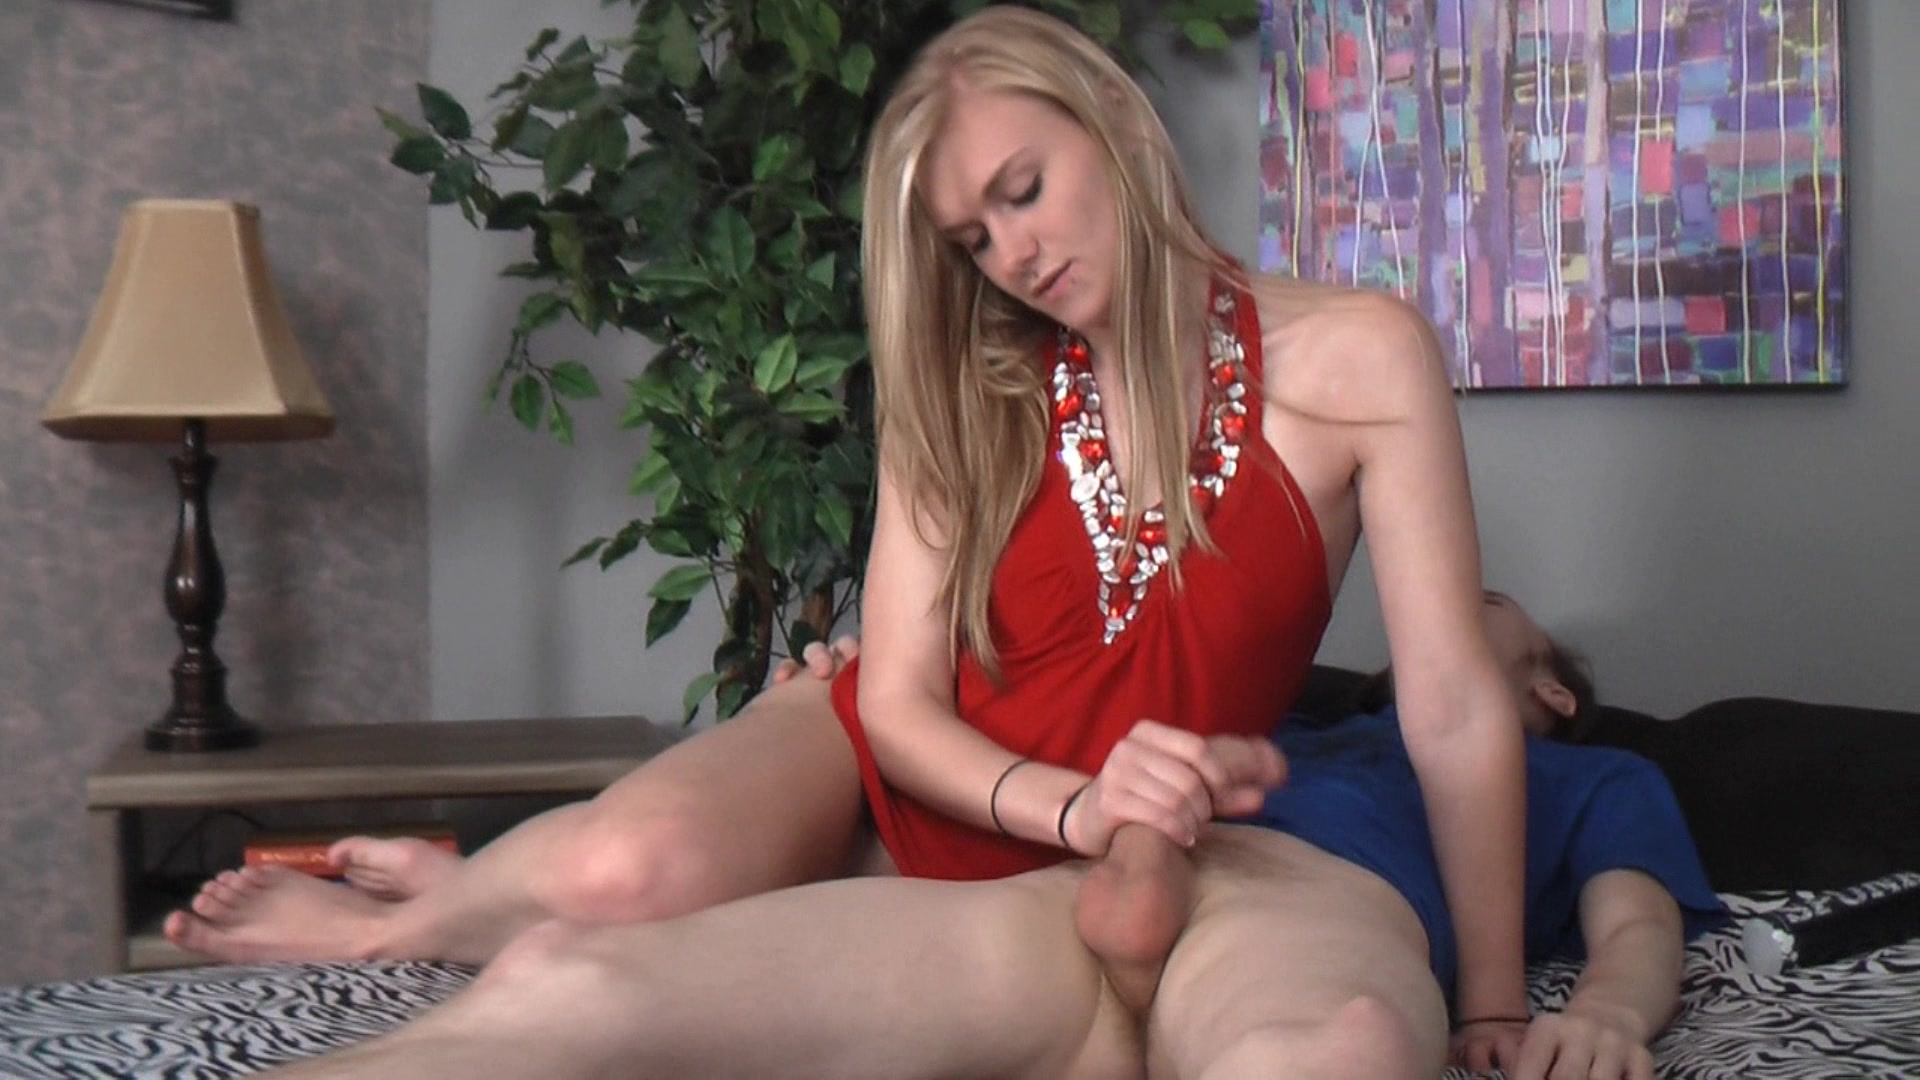 jerky girls porn